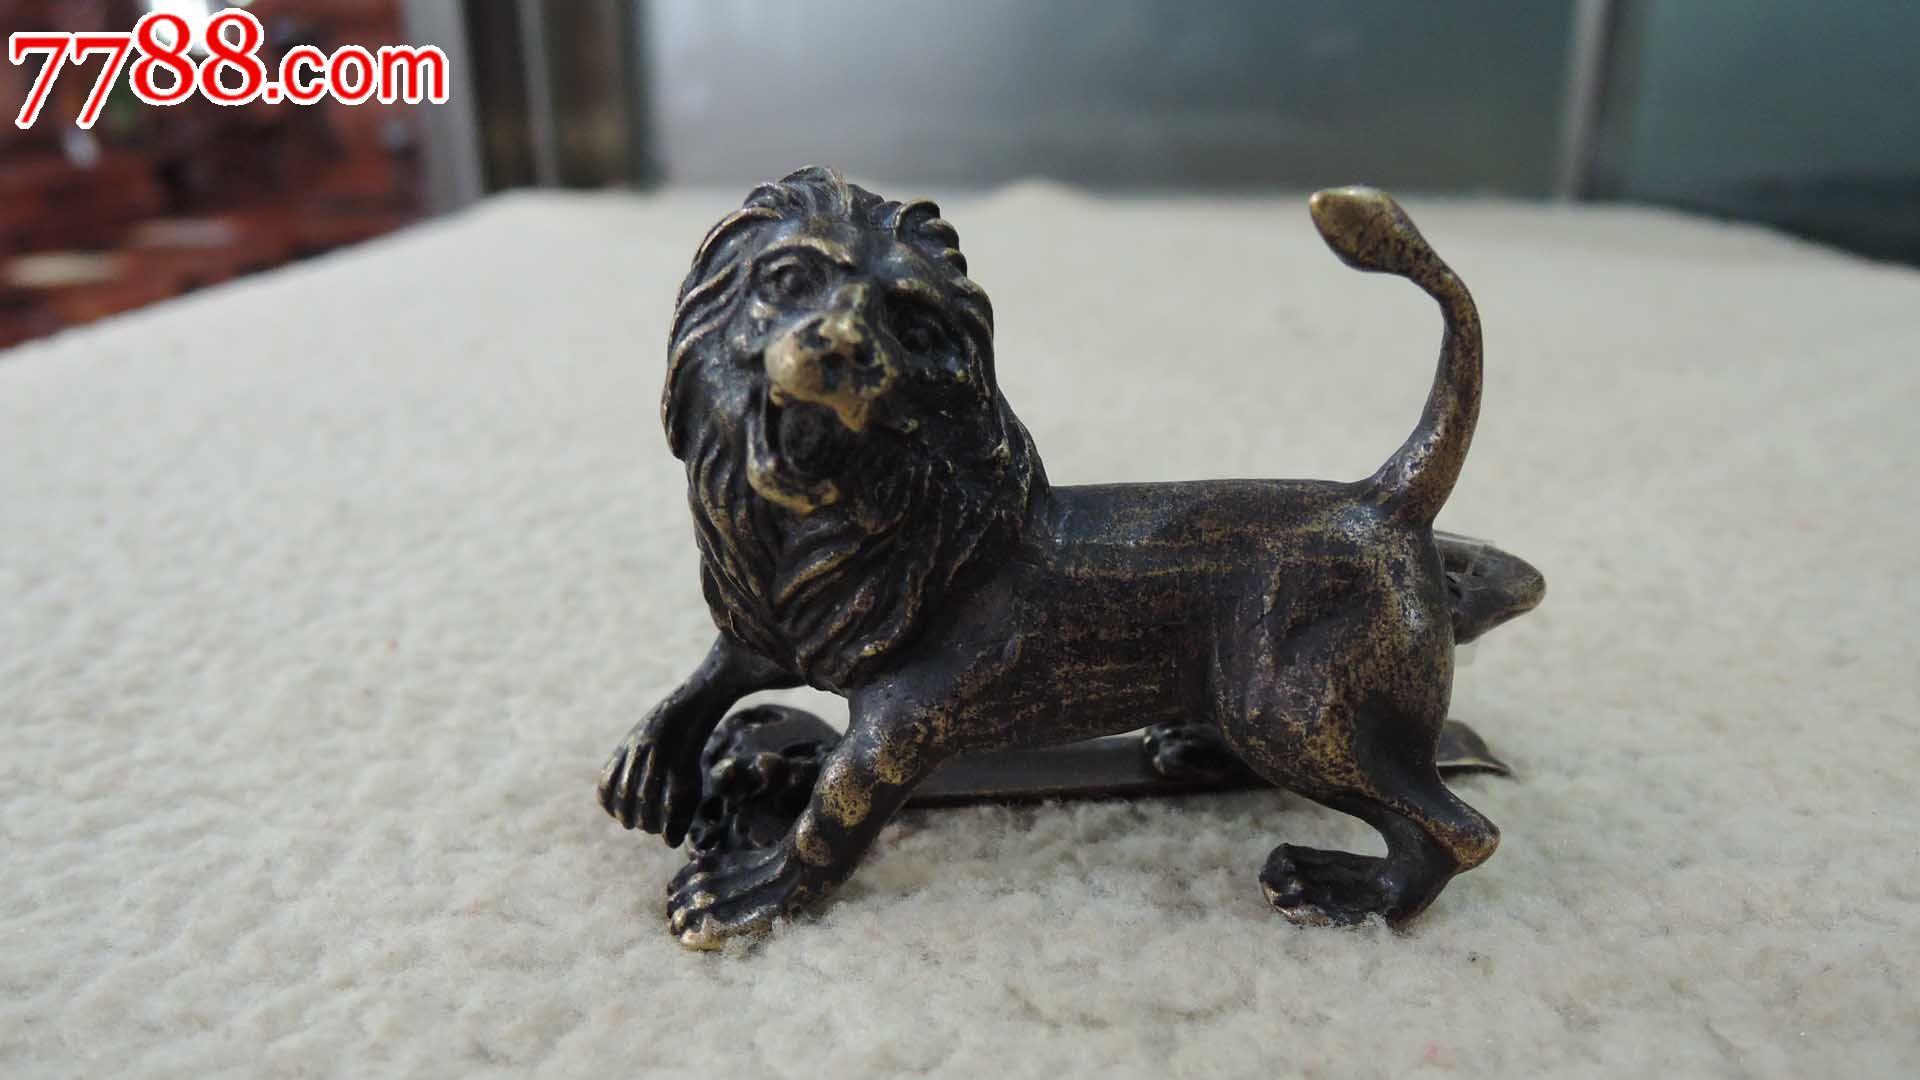 1920x1080狮子手绘